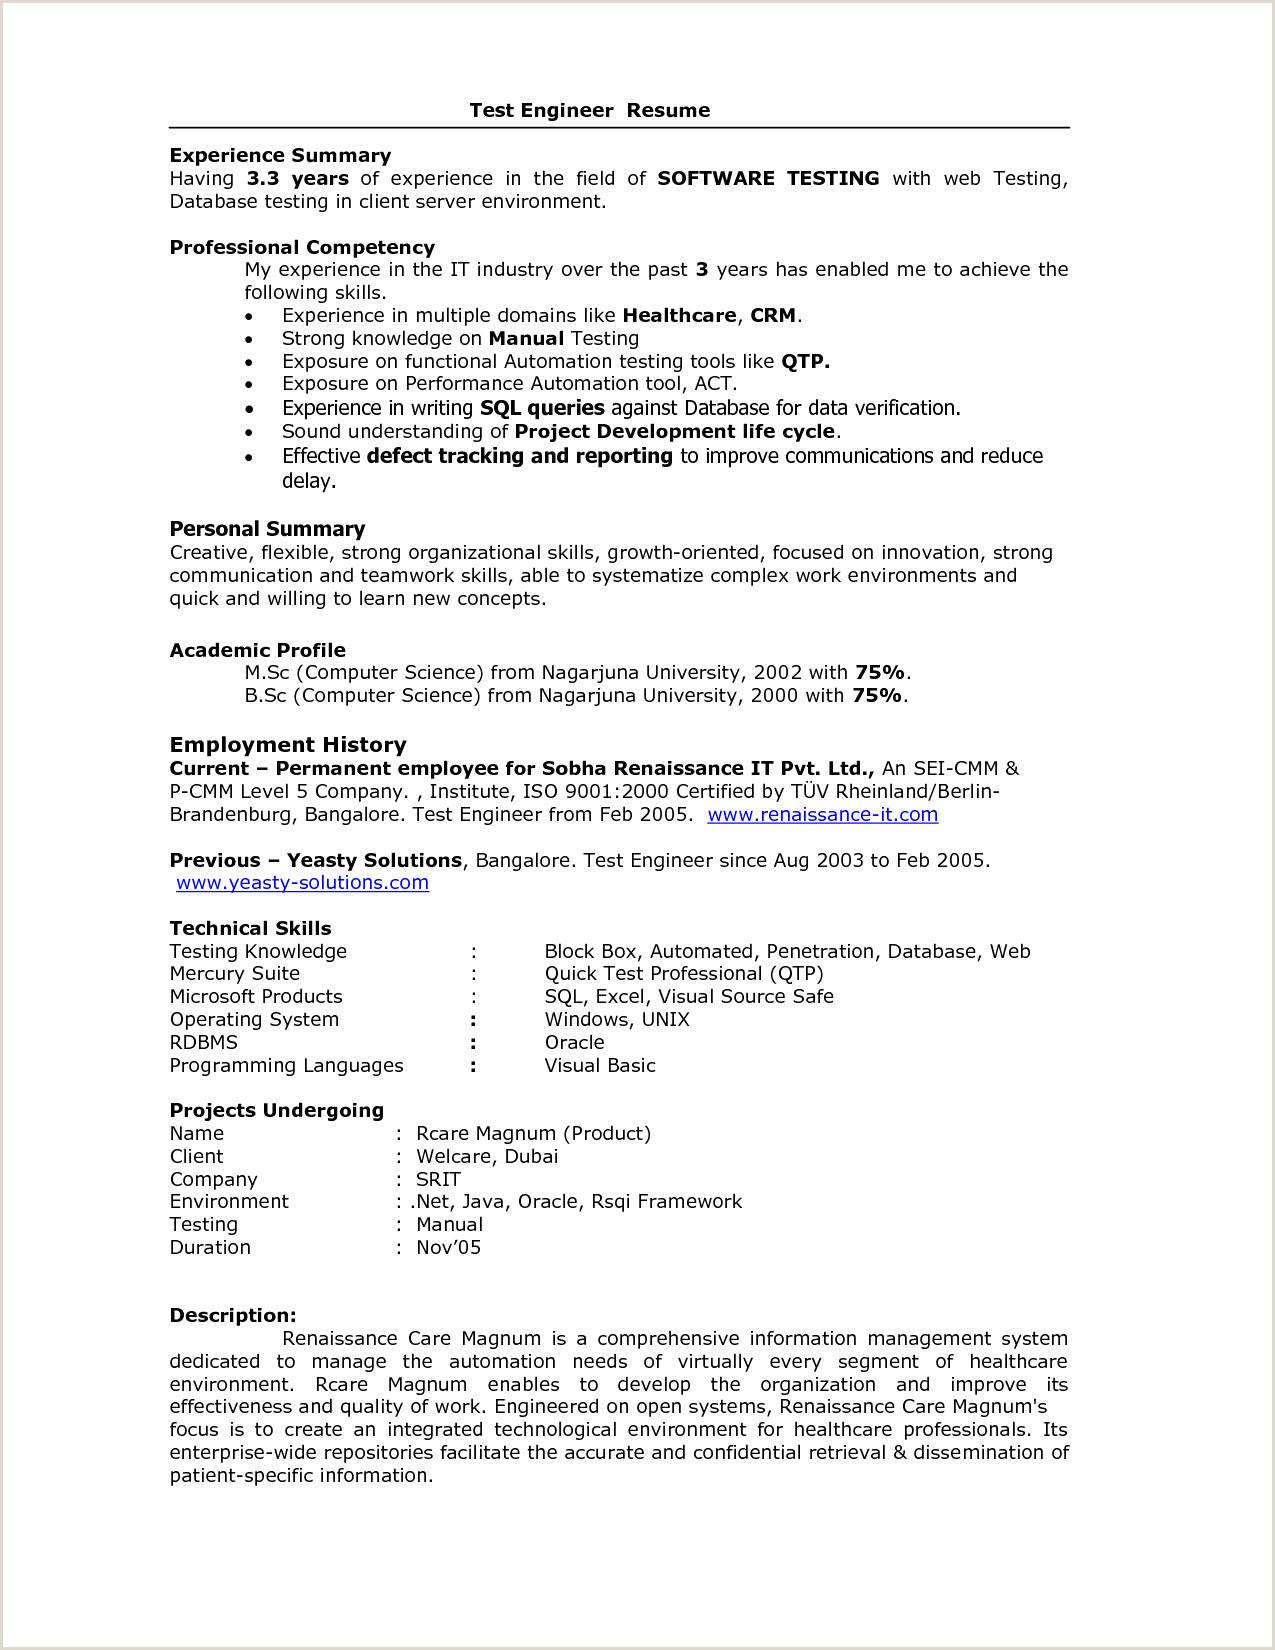 Fresher Resume format for Testing College Resume Samples